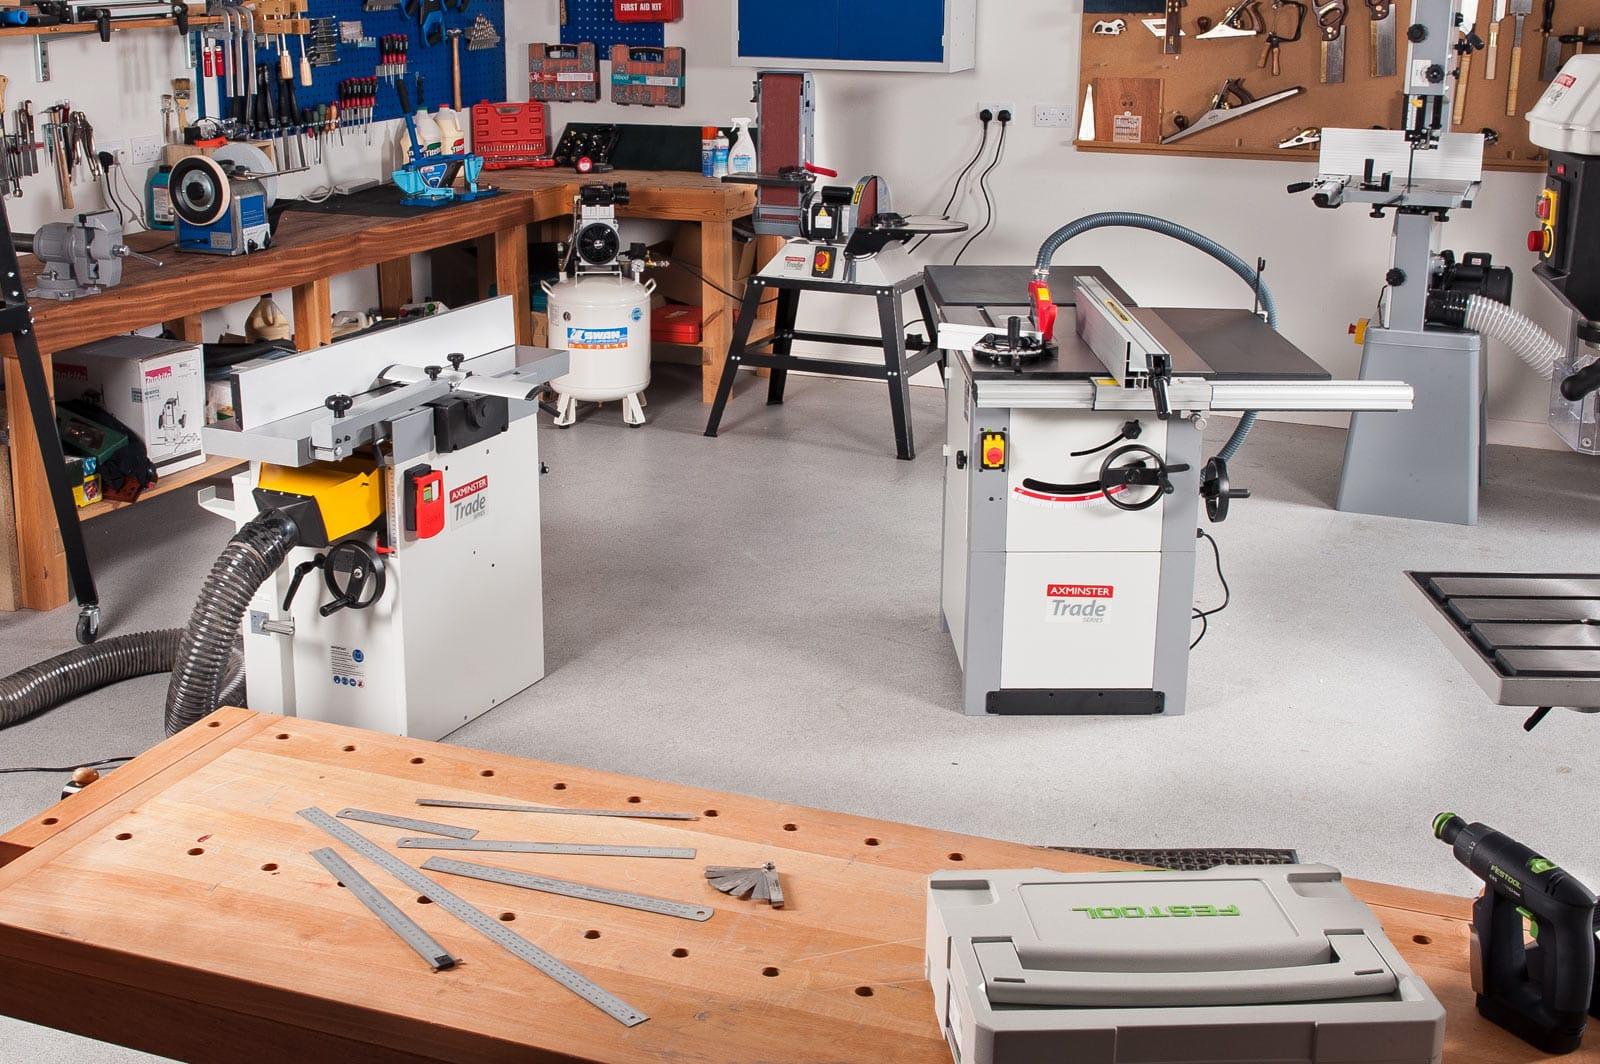 Axminster Trade Series machinery